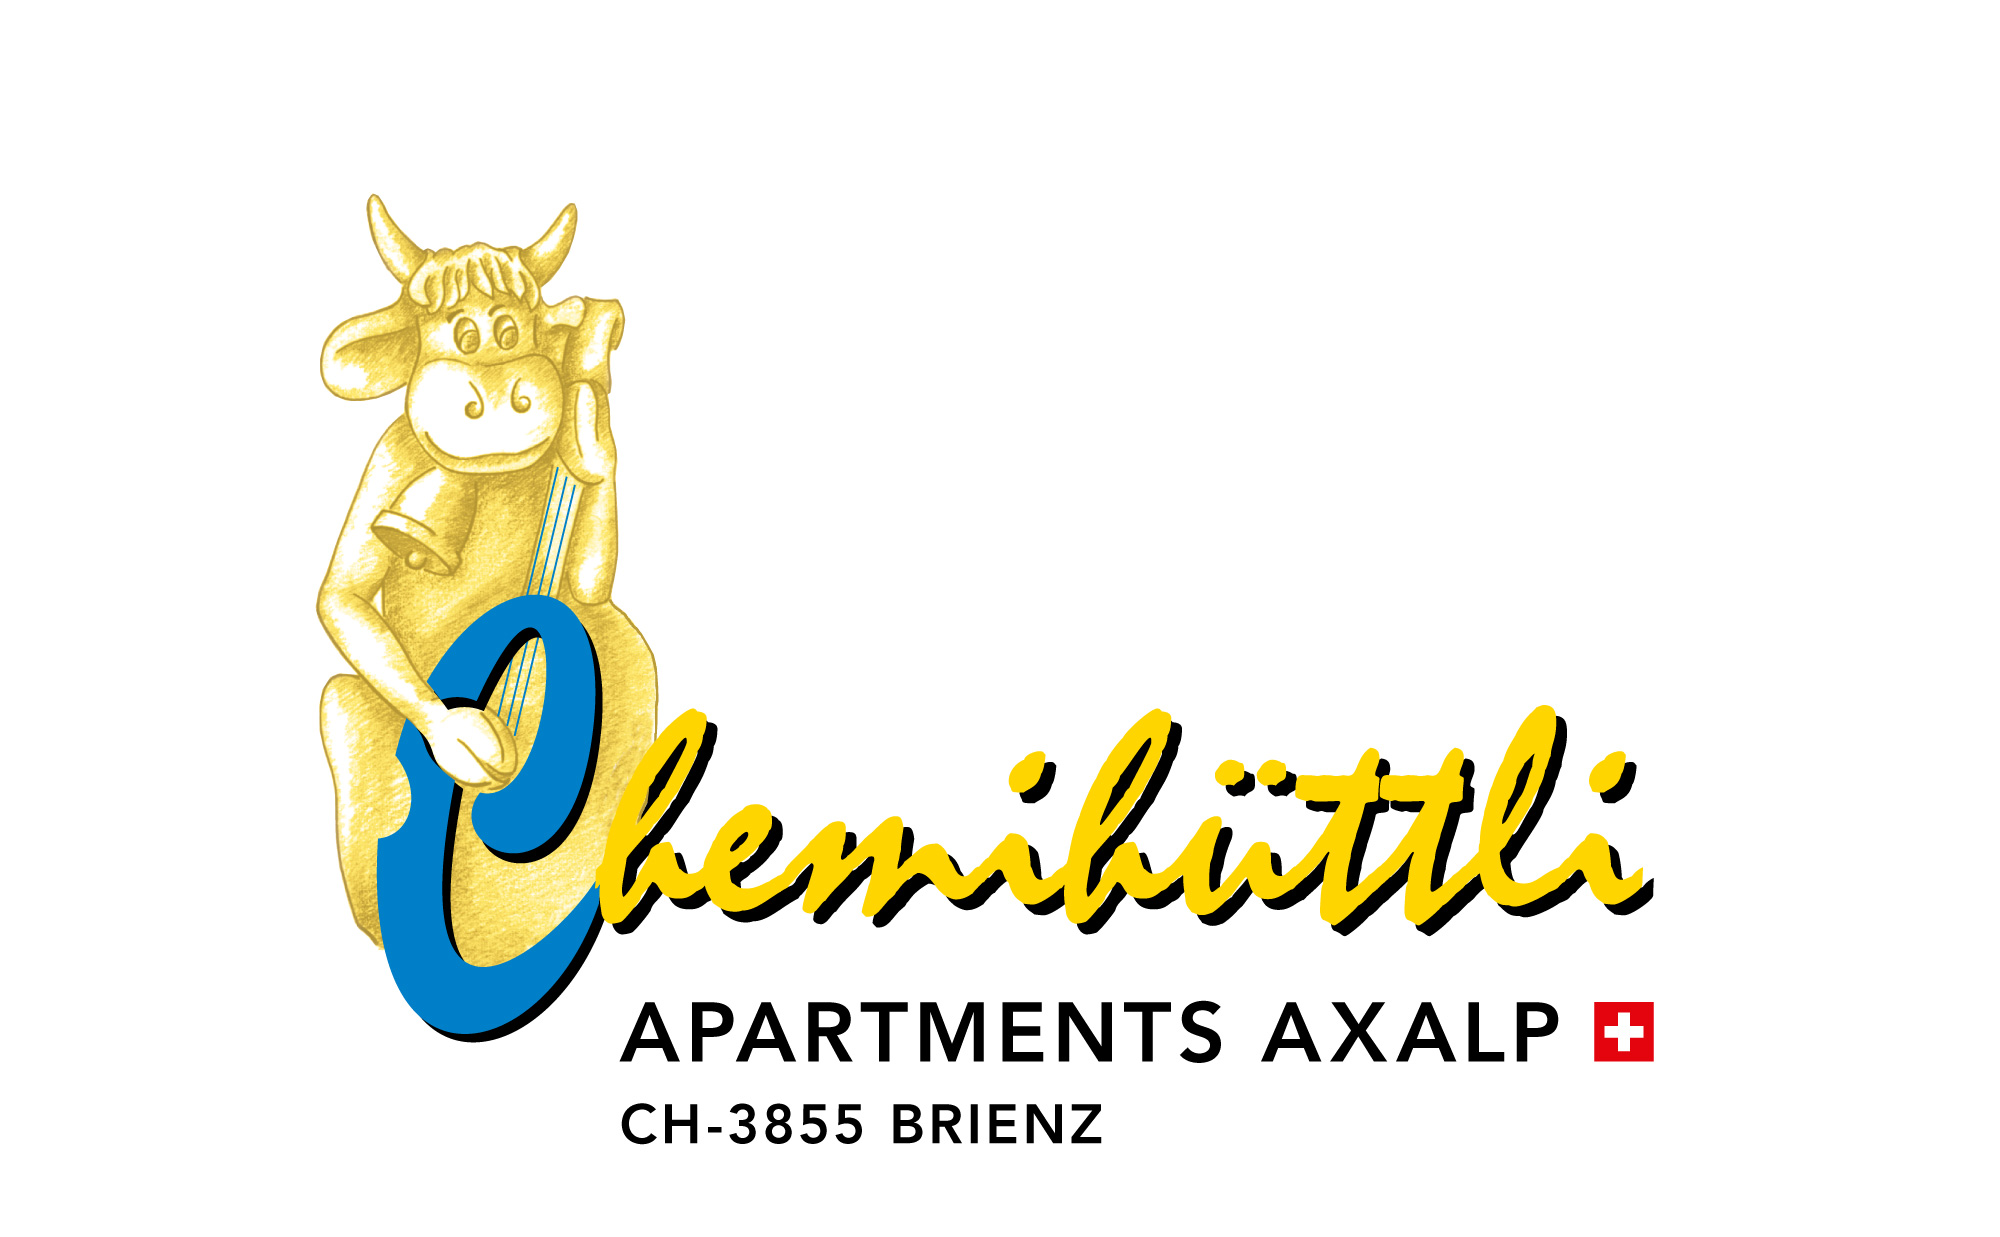 Chemihüttli Apartments Axalp